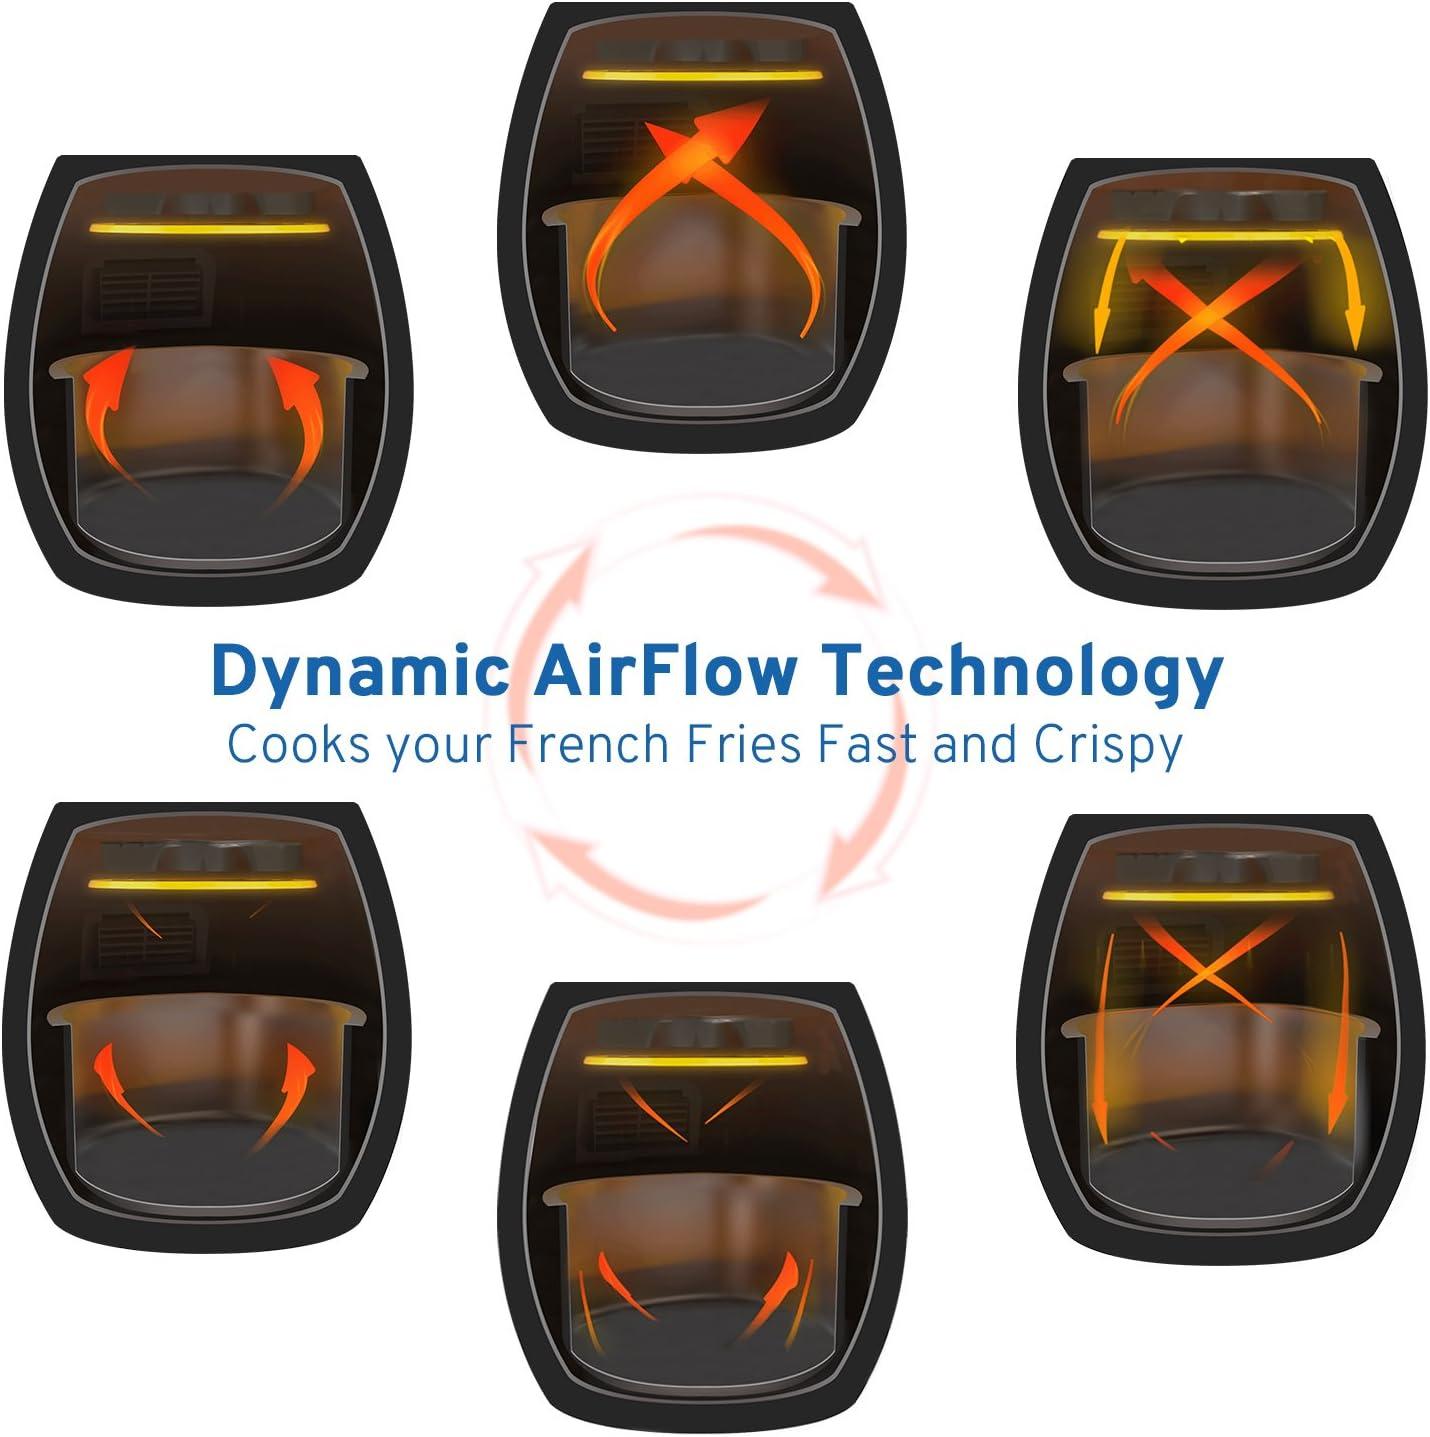 dynamic airflow technology